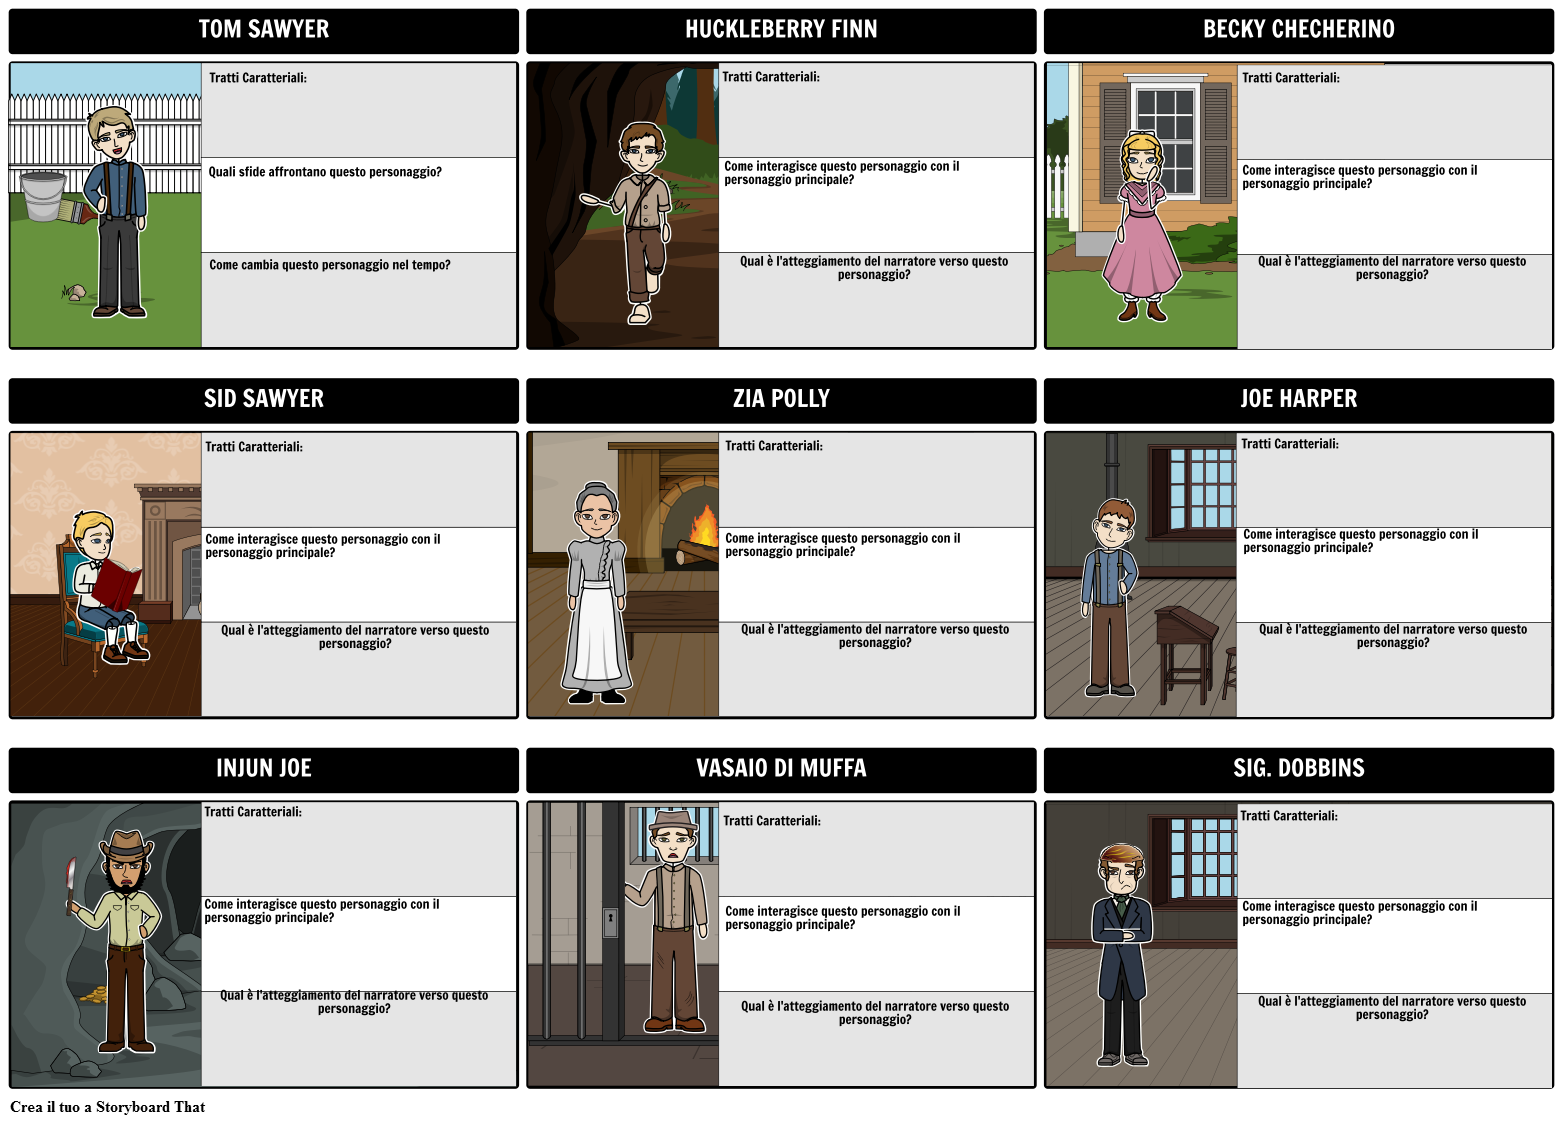 Le Avventure di Tom Sawyer Character Map